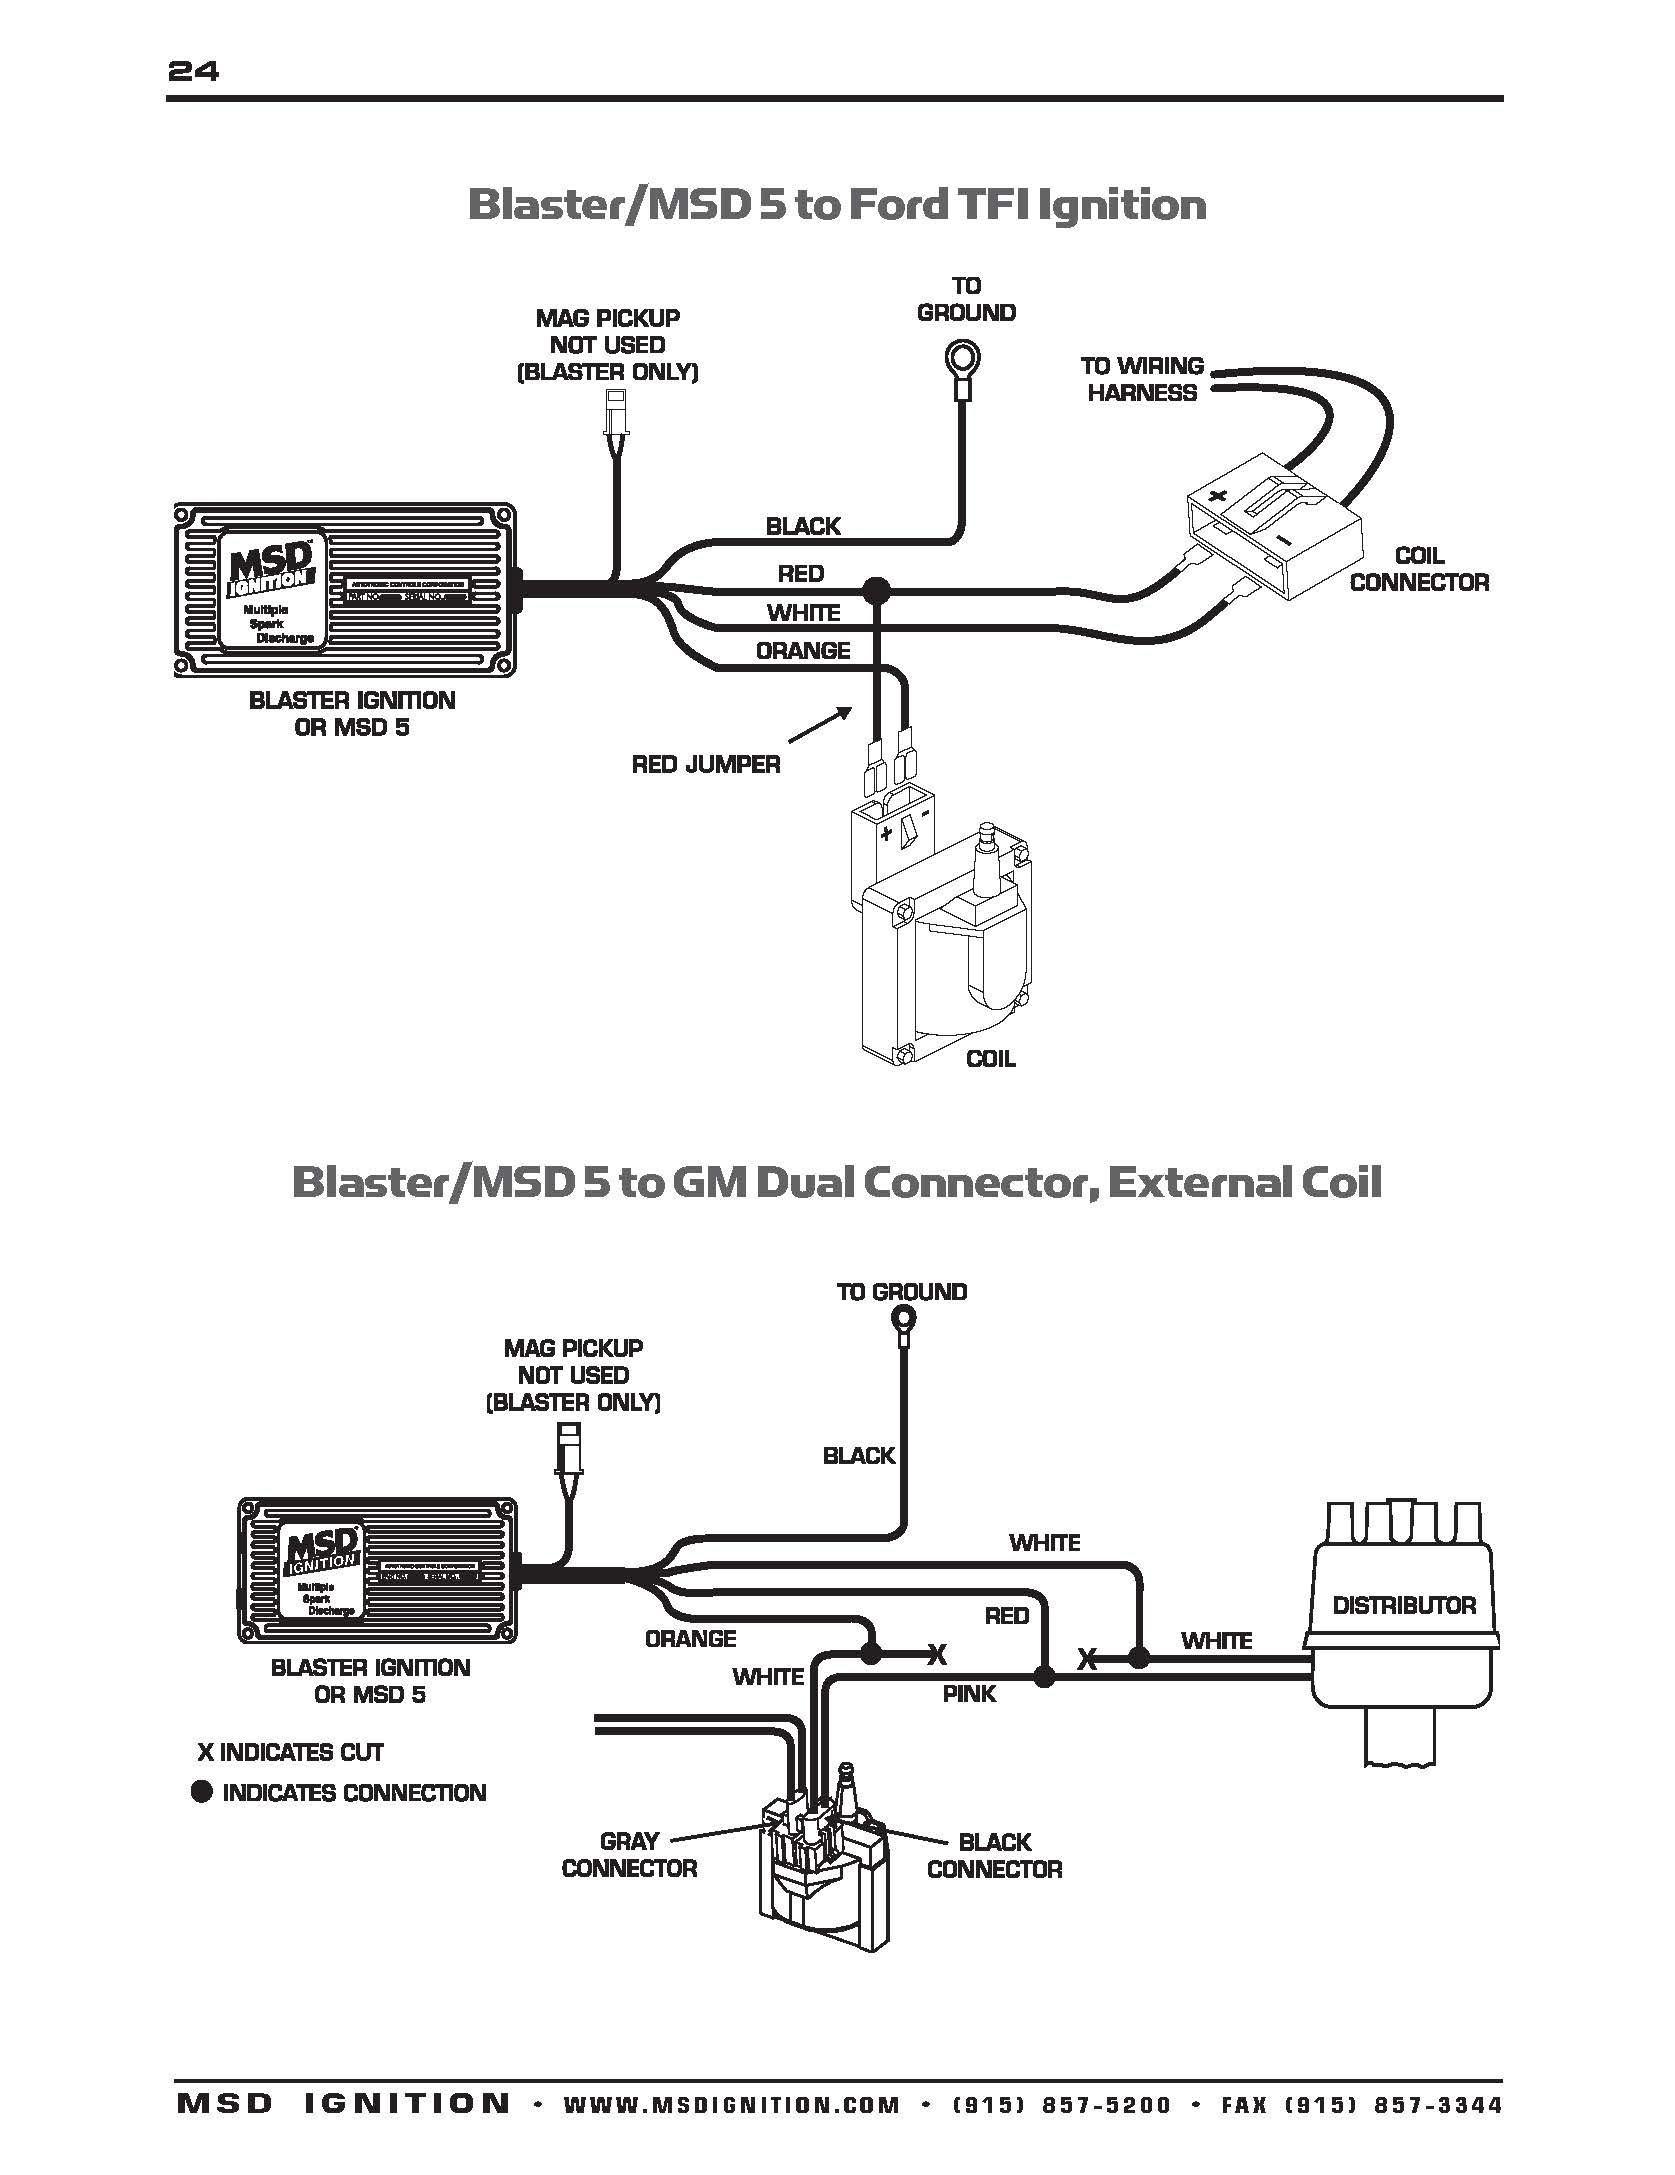 Msd 85551 Wiring Diagram - Wiring Diagram All on hei distributor wiring diagram, cam wiring diagram, shift light wiring diagram, brake lights wiring diagram, a/c wiring diagram, pcm wiring diagram, coil wiring diagram, rev wiring diagram, harness wiring diagram, mallory ignition wiring diagram, aem wideband wiring diagram, 6aln wiring diagram, electric fan wiring diagram, autometer wiring diagram, line lock wiring diagram, power windows wiring diagram, alternator wiring diagram, ignition switch wiring diagram,